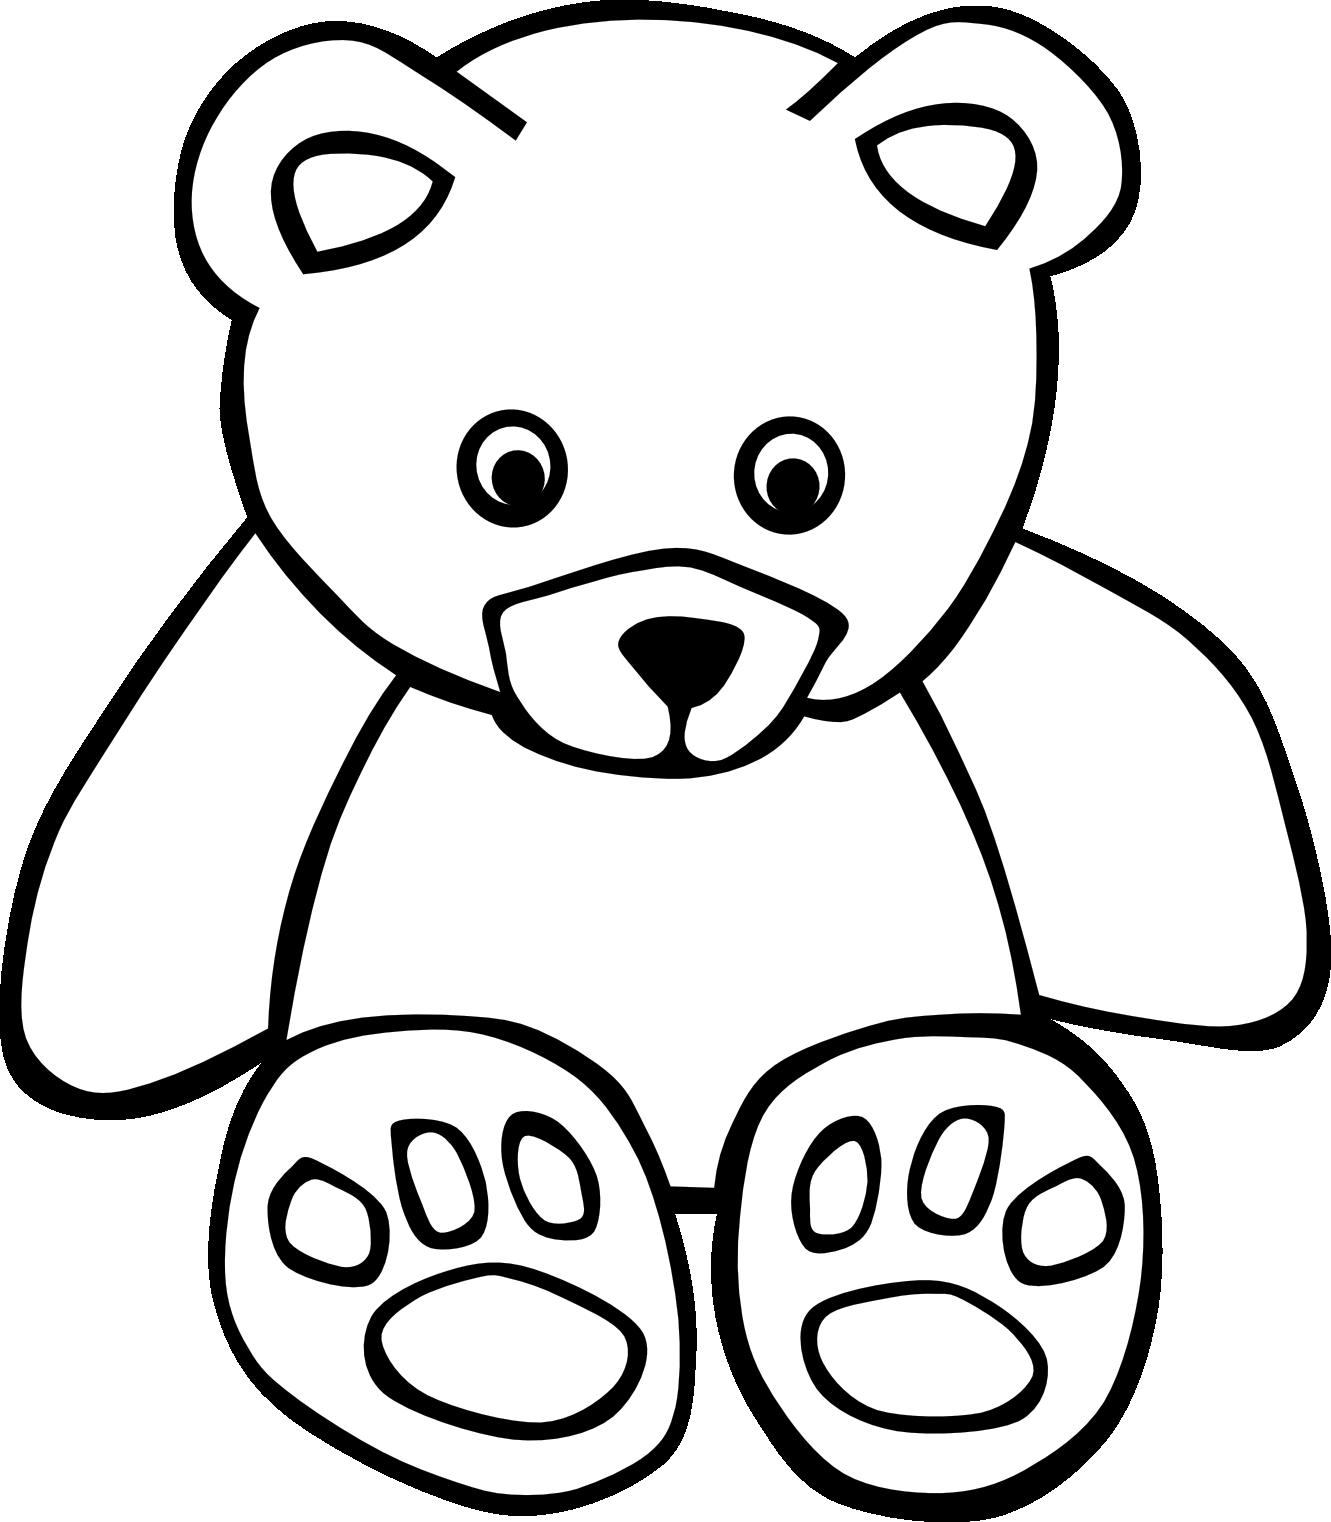 1331x1522 Image Of Bear Cub Clipart